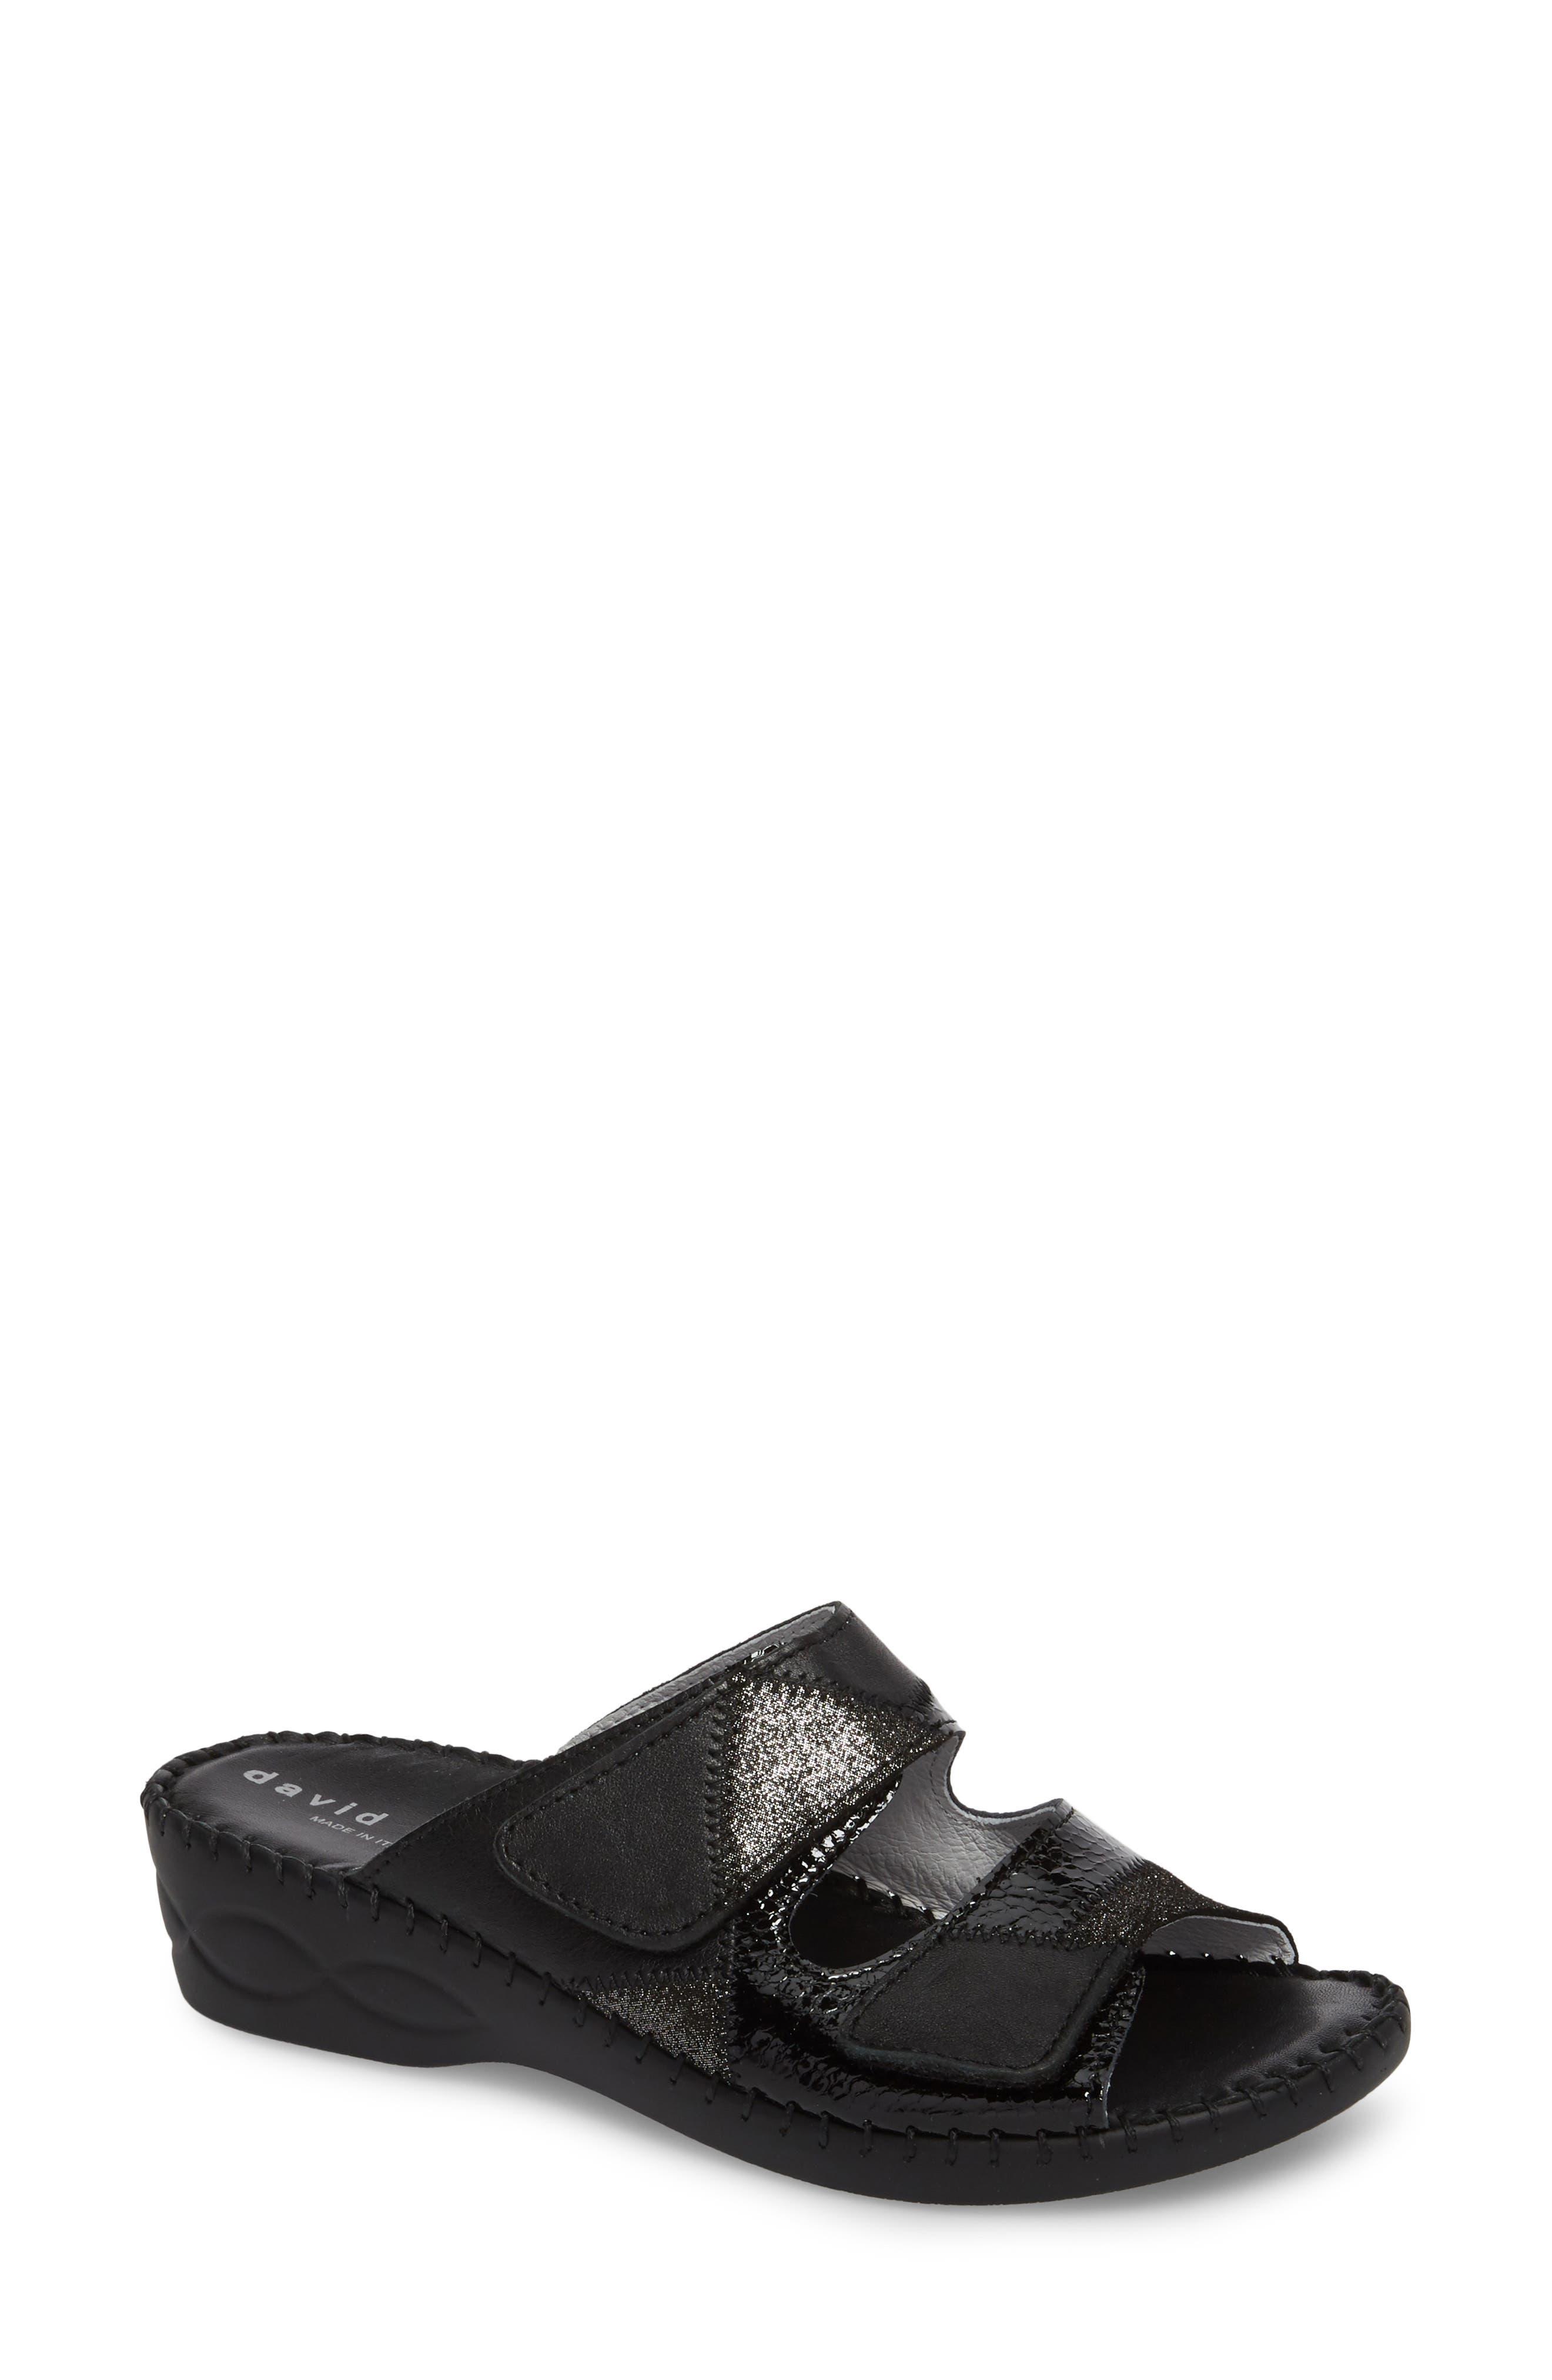 DAVID TATE Flex Slide Sandal, Main, color, BLACK LEATHER